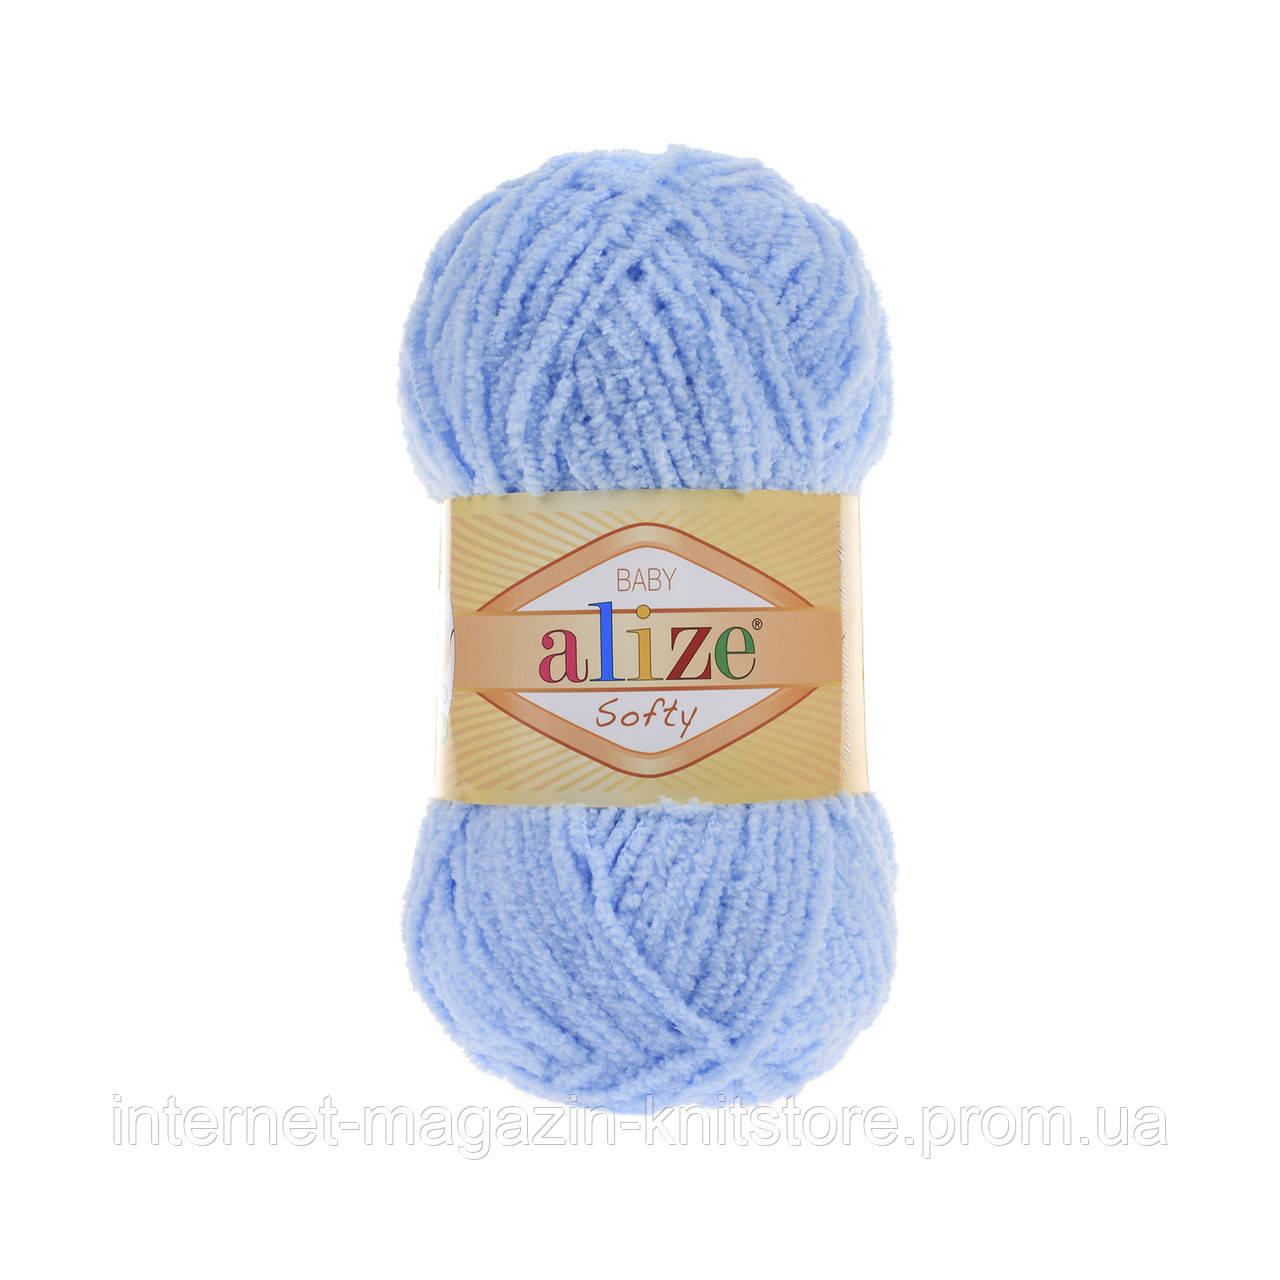 Пряжа Alize Softy Голубой